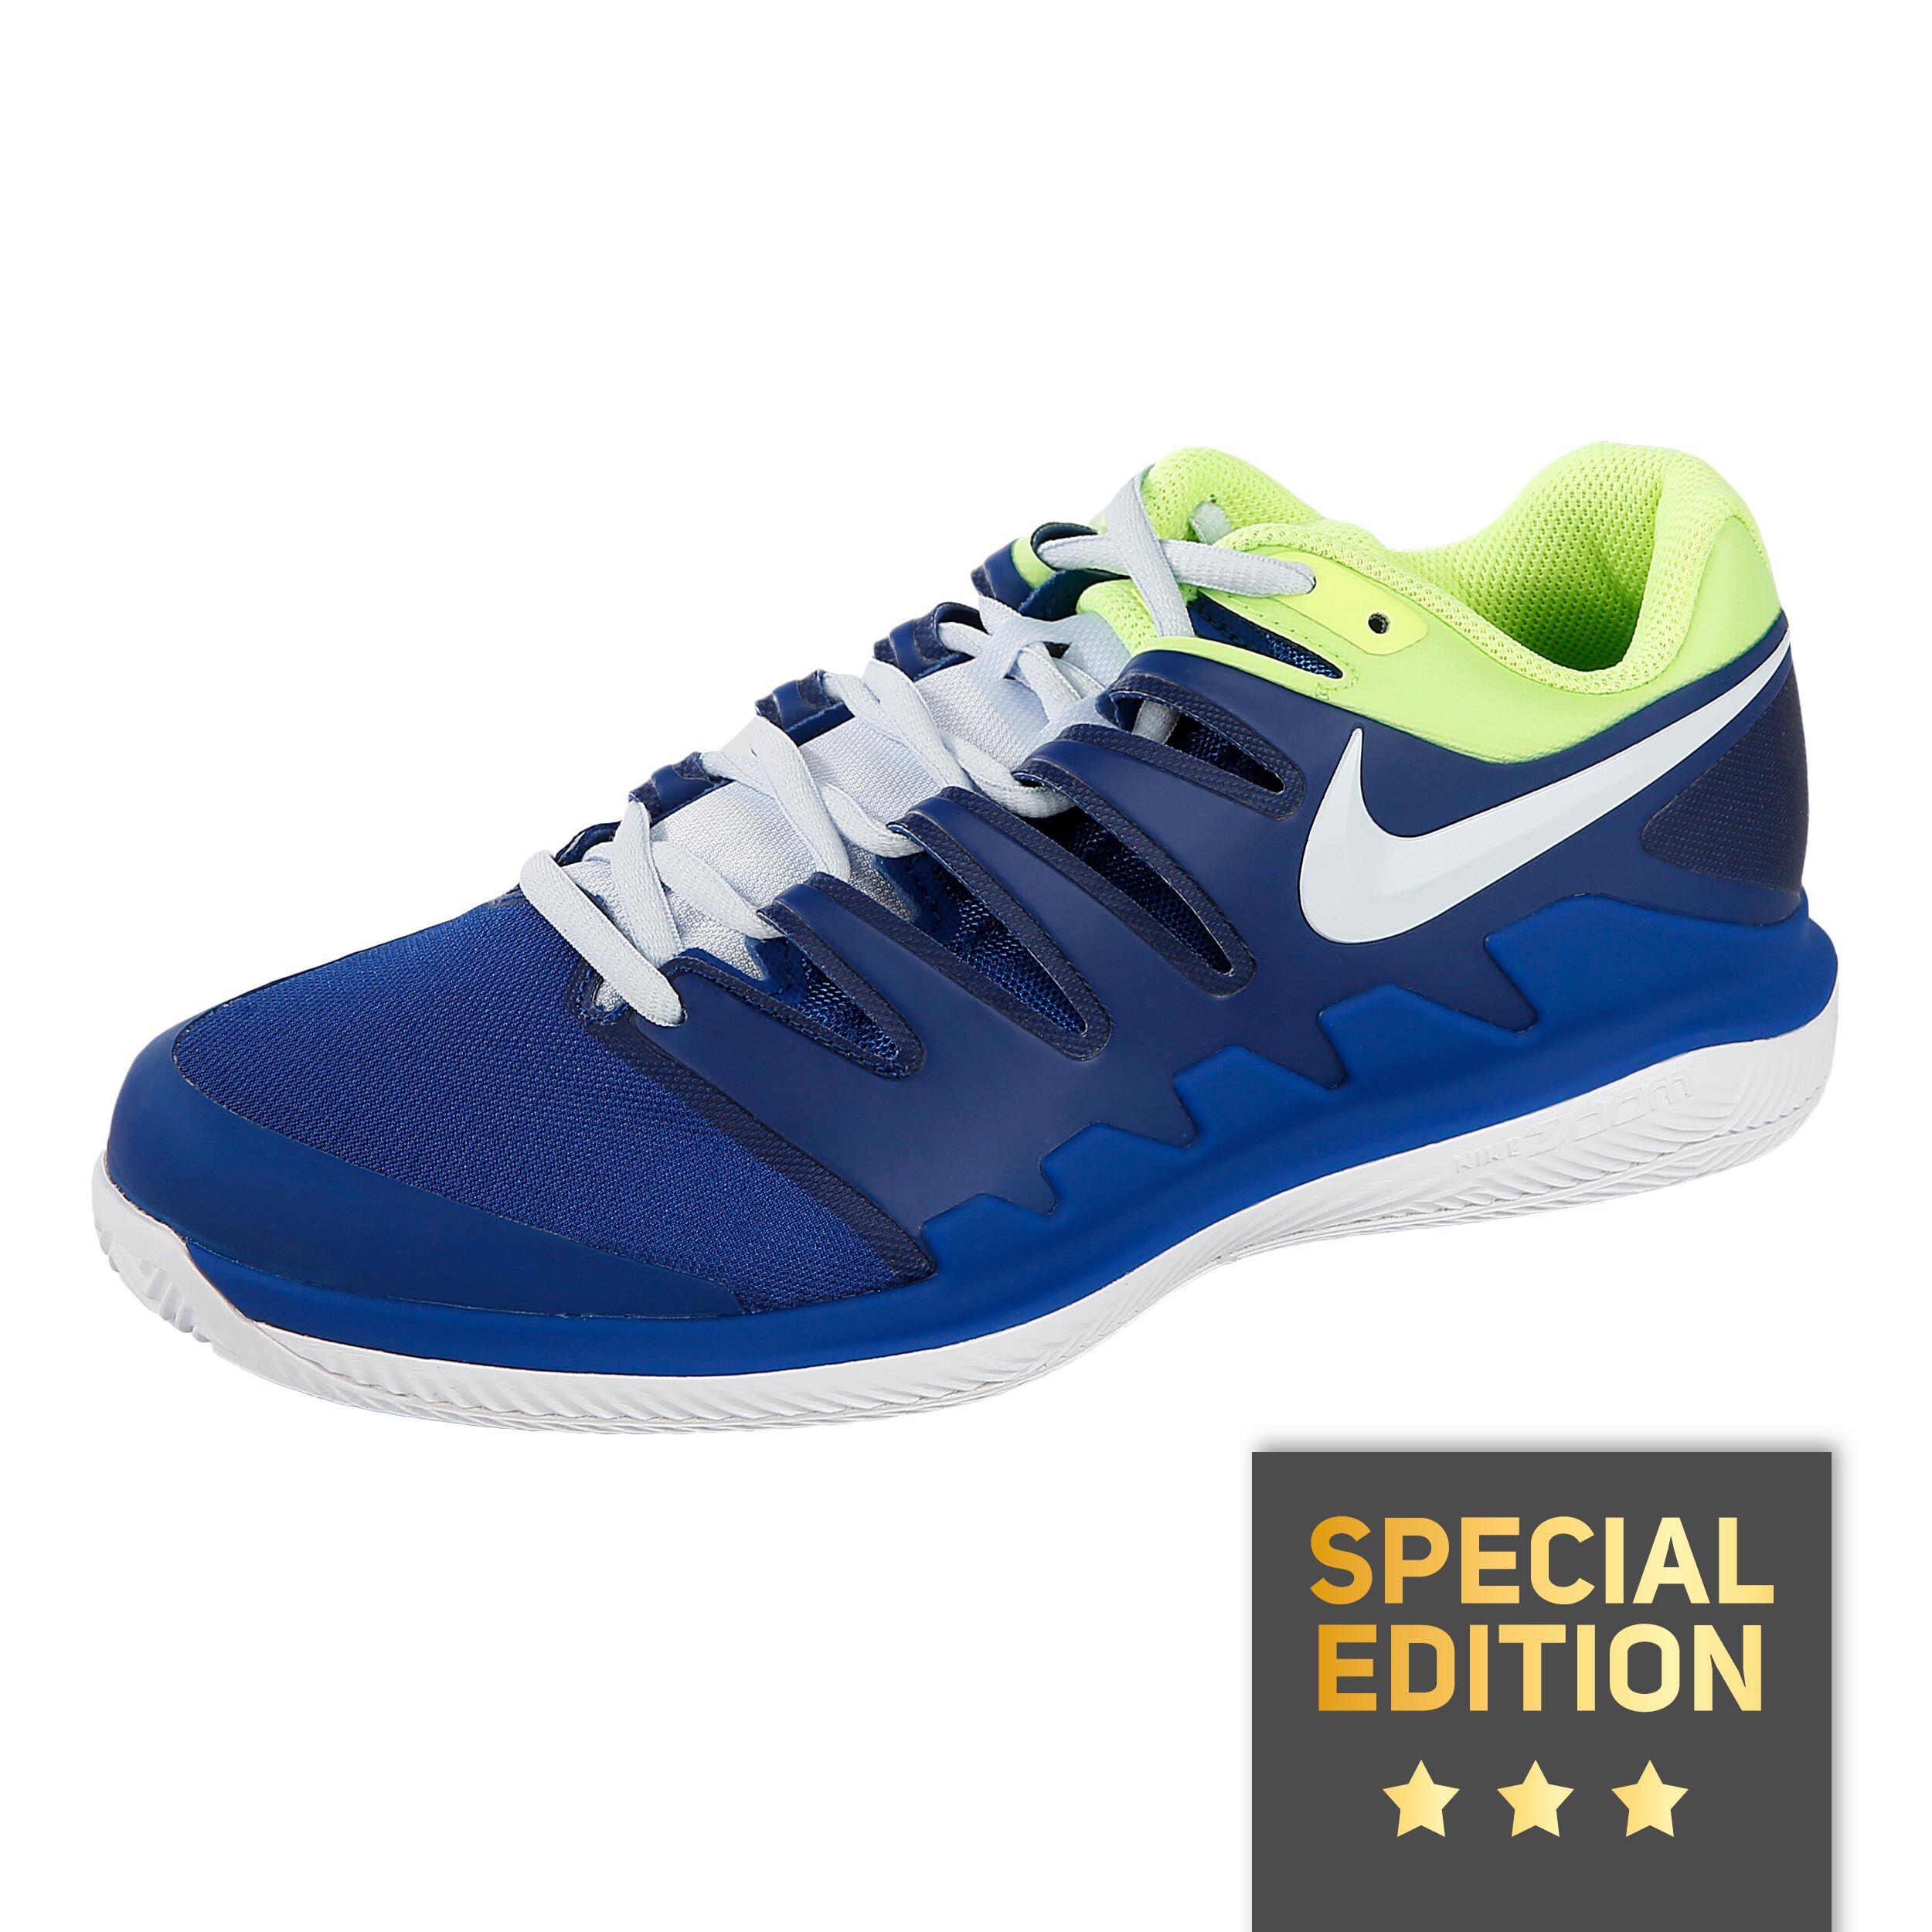 Nike Air Zoom Vapor X Clay Chaussure Terre Battue Edition Spéciale ...